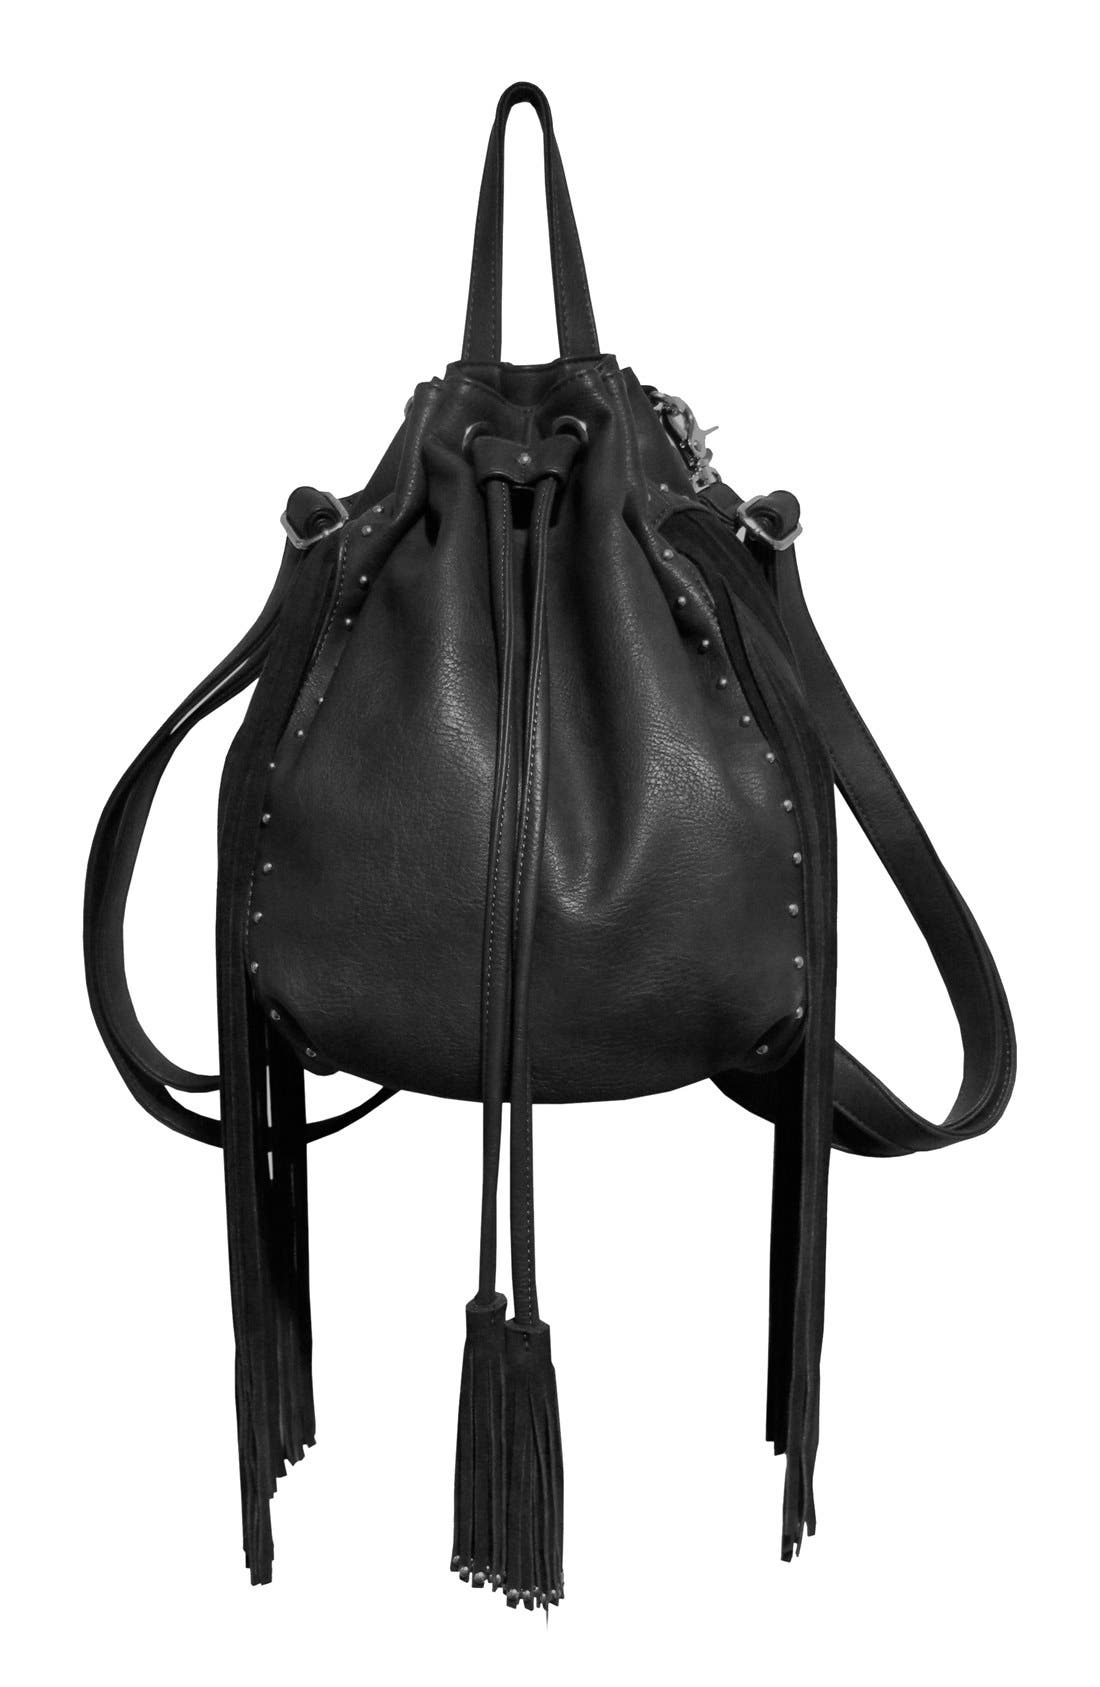 Alternate Image 1 Selected - Urban Originals 'Forbidden' Convertible Drawstring Backpack